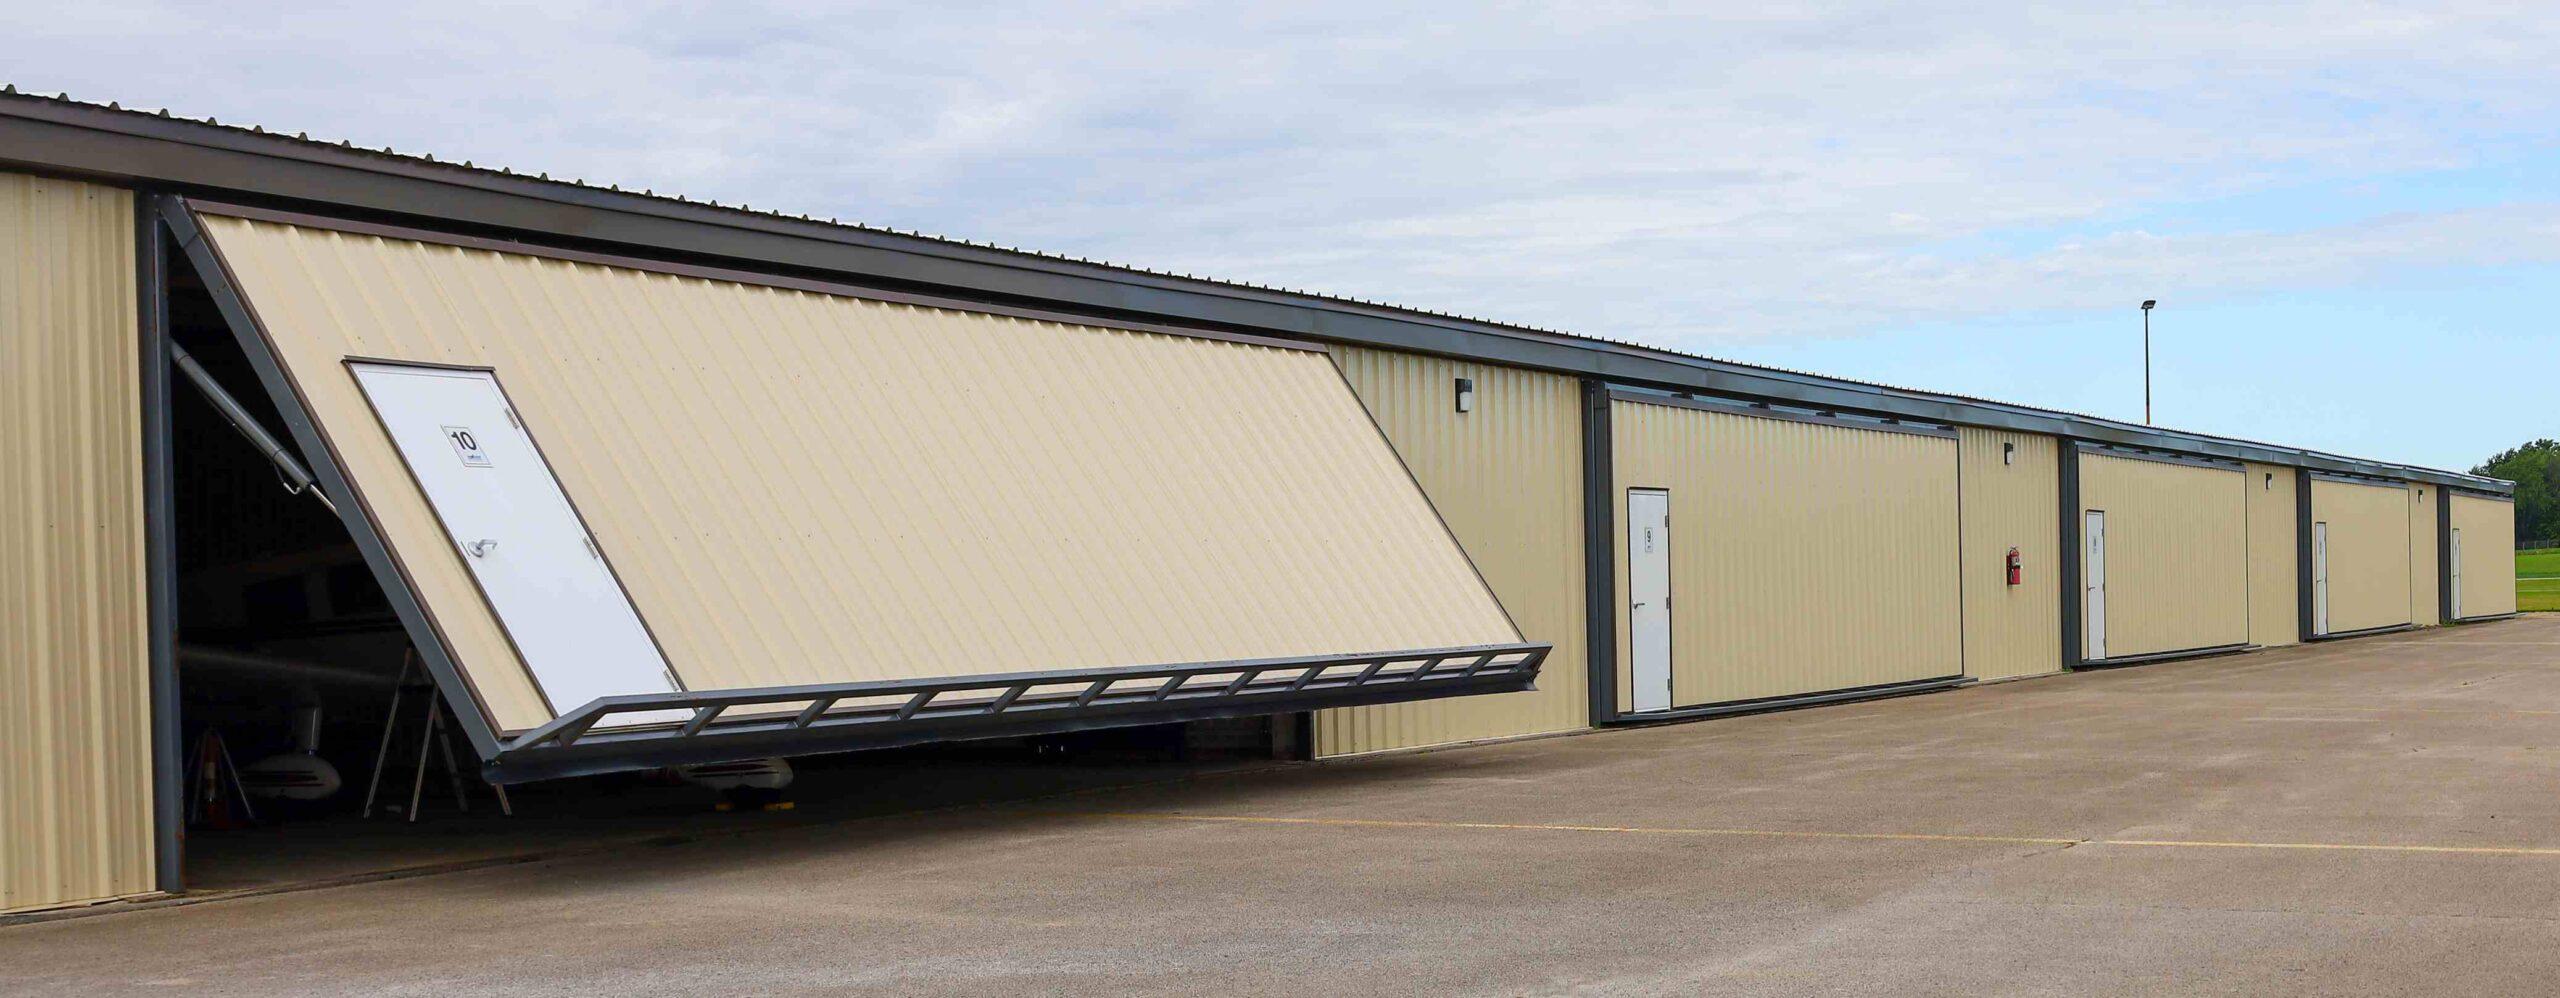 Ten old sliding hangar doors replaced with PowerLifts.